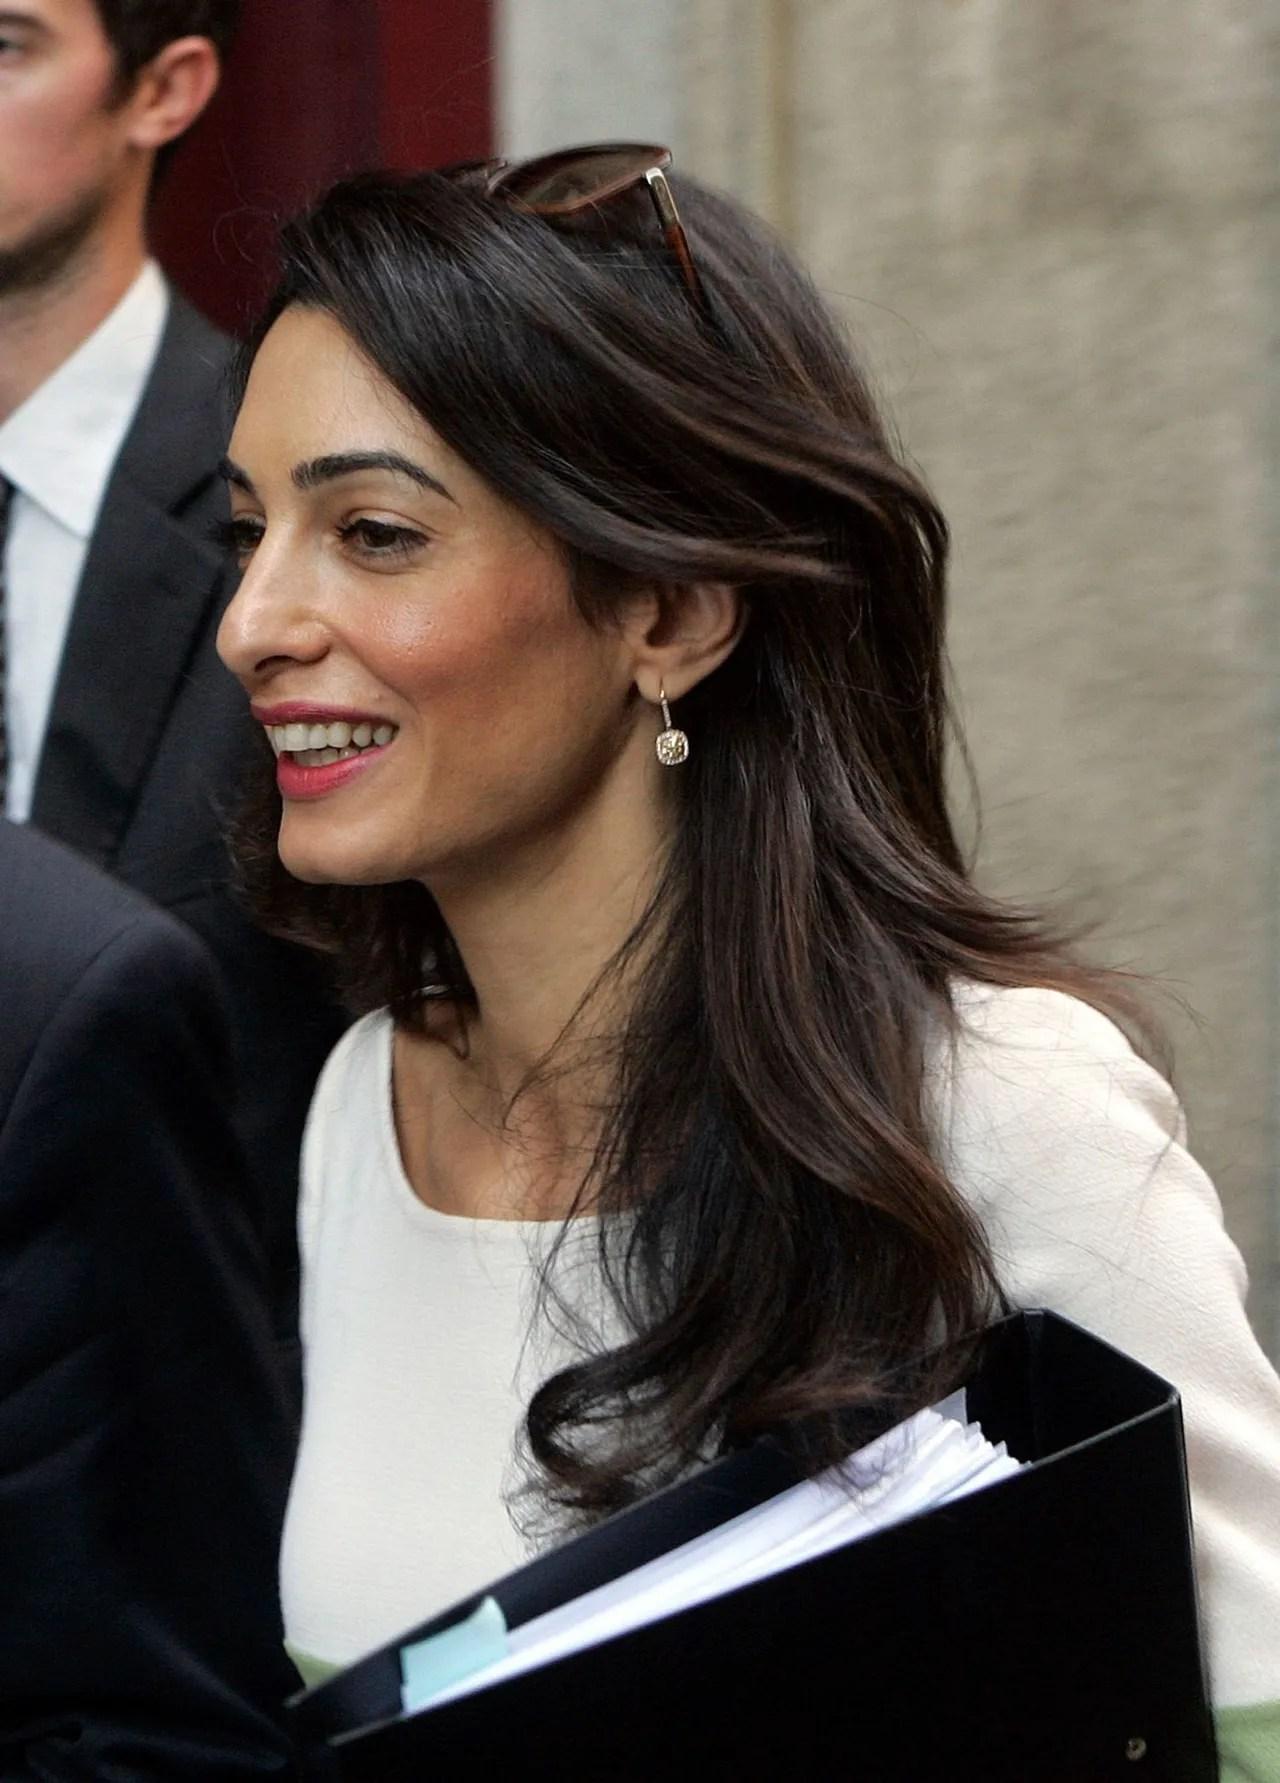 Amal Alamuddin Clooney Might Give Kate Middleton